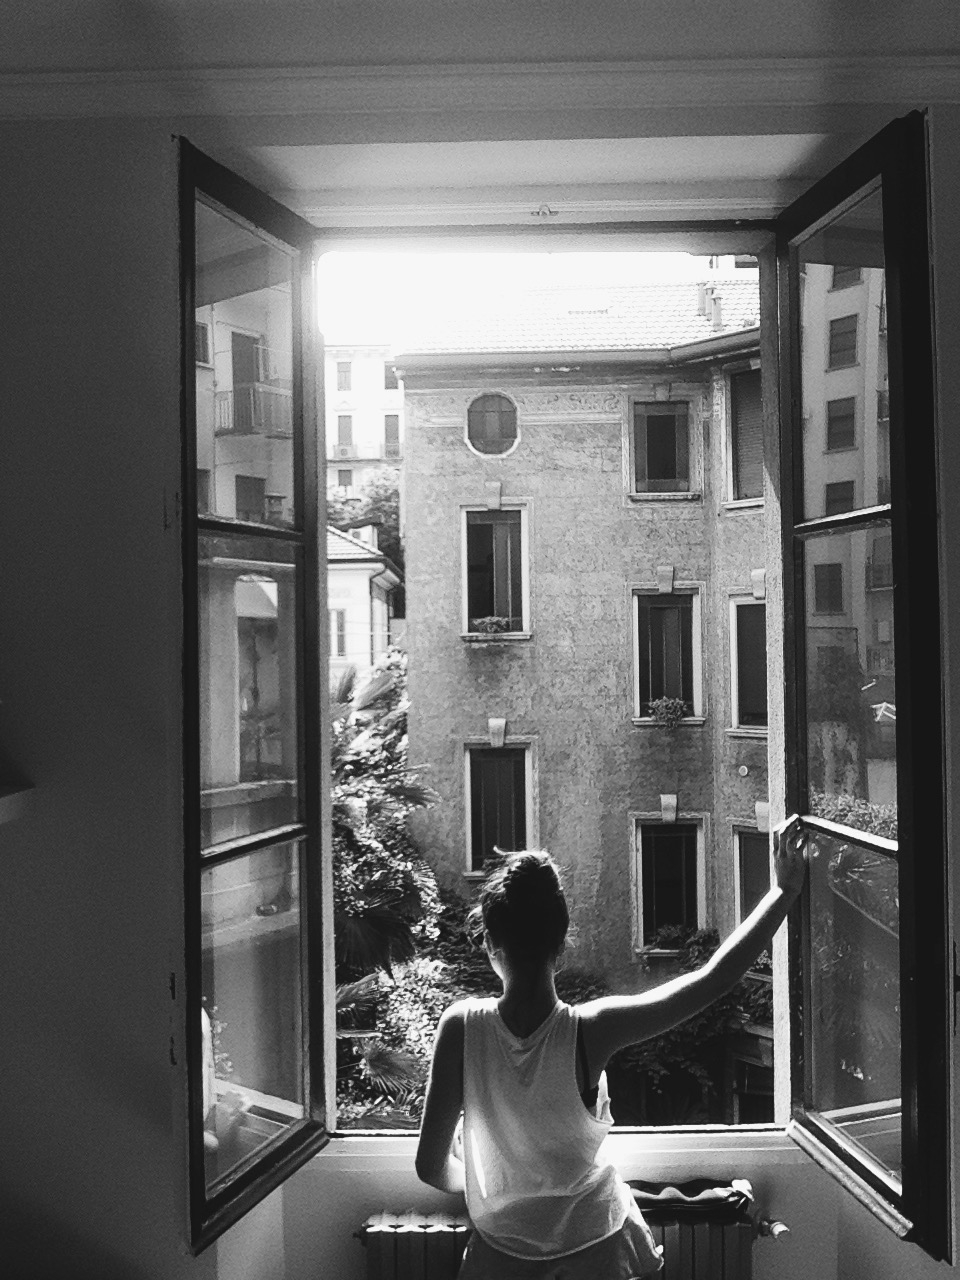 44_Elena_Cavallaro_Bullejos_Photo_1_Thinking about future.jpg